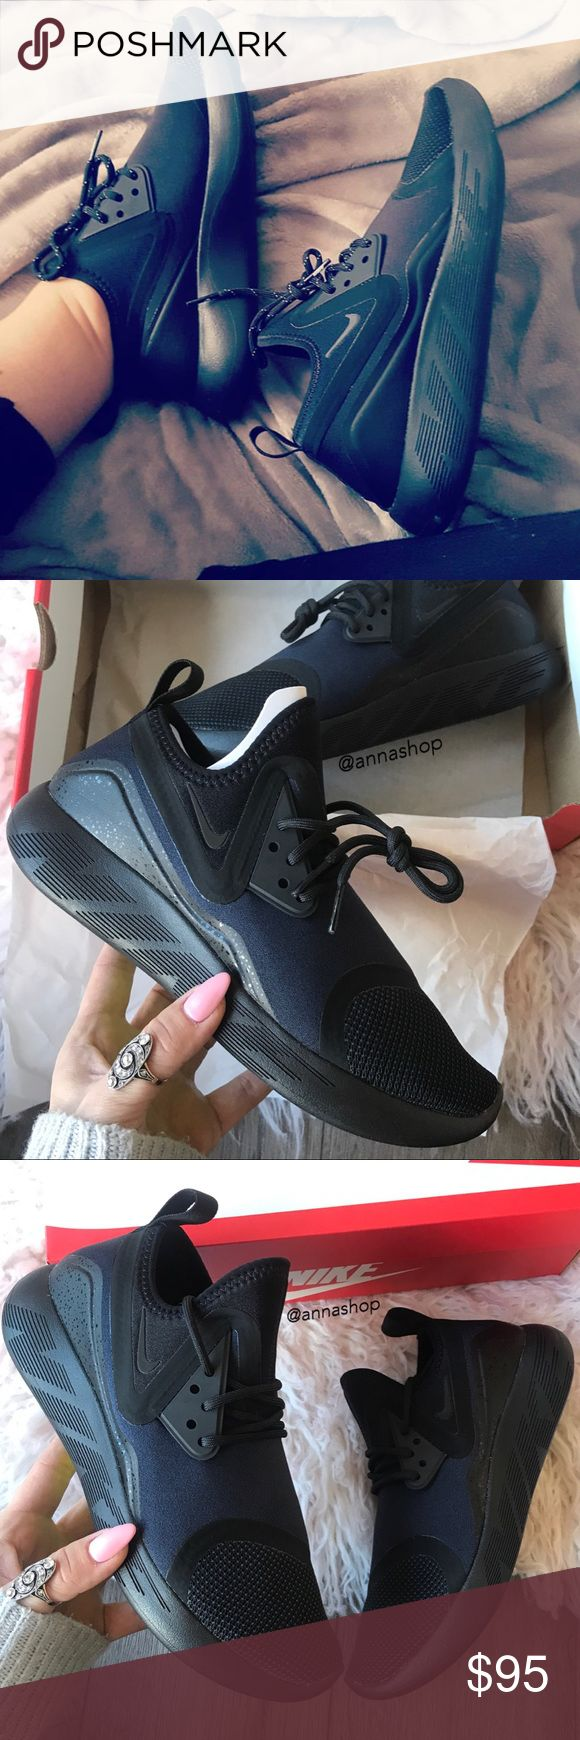 black leather nikes lunarlon womens nike